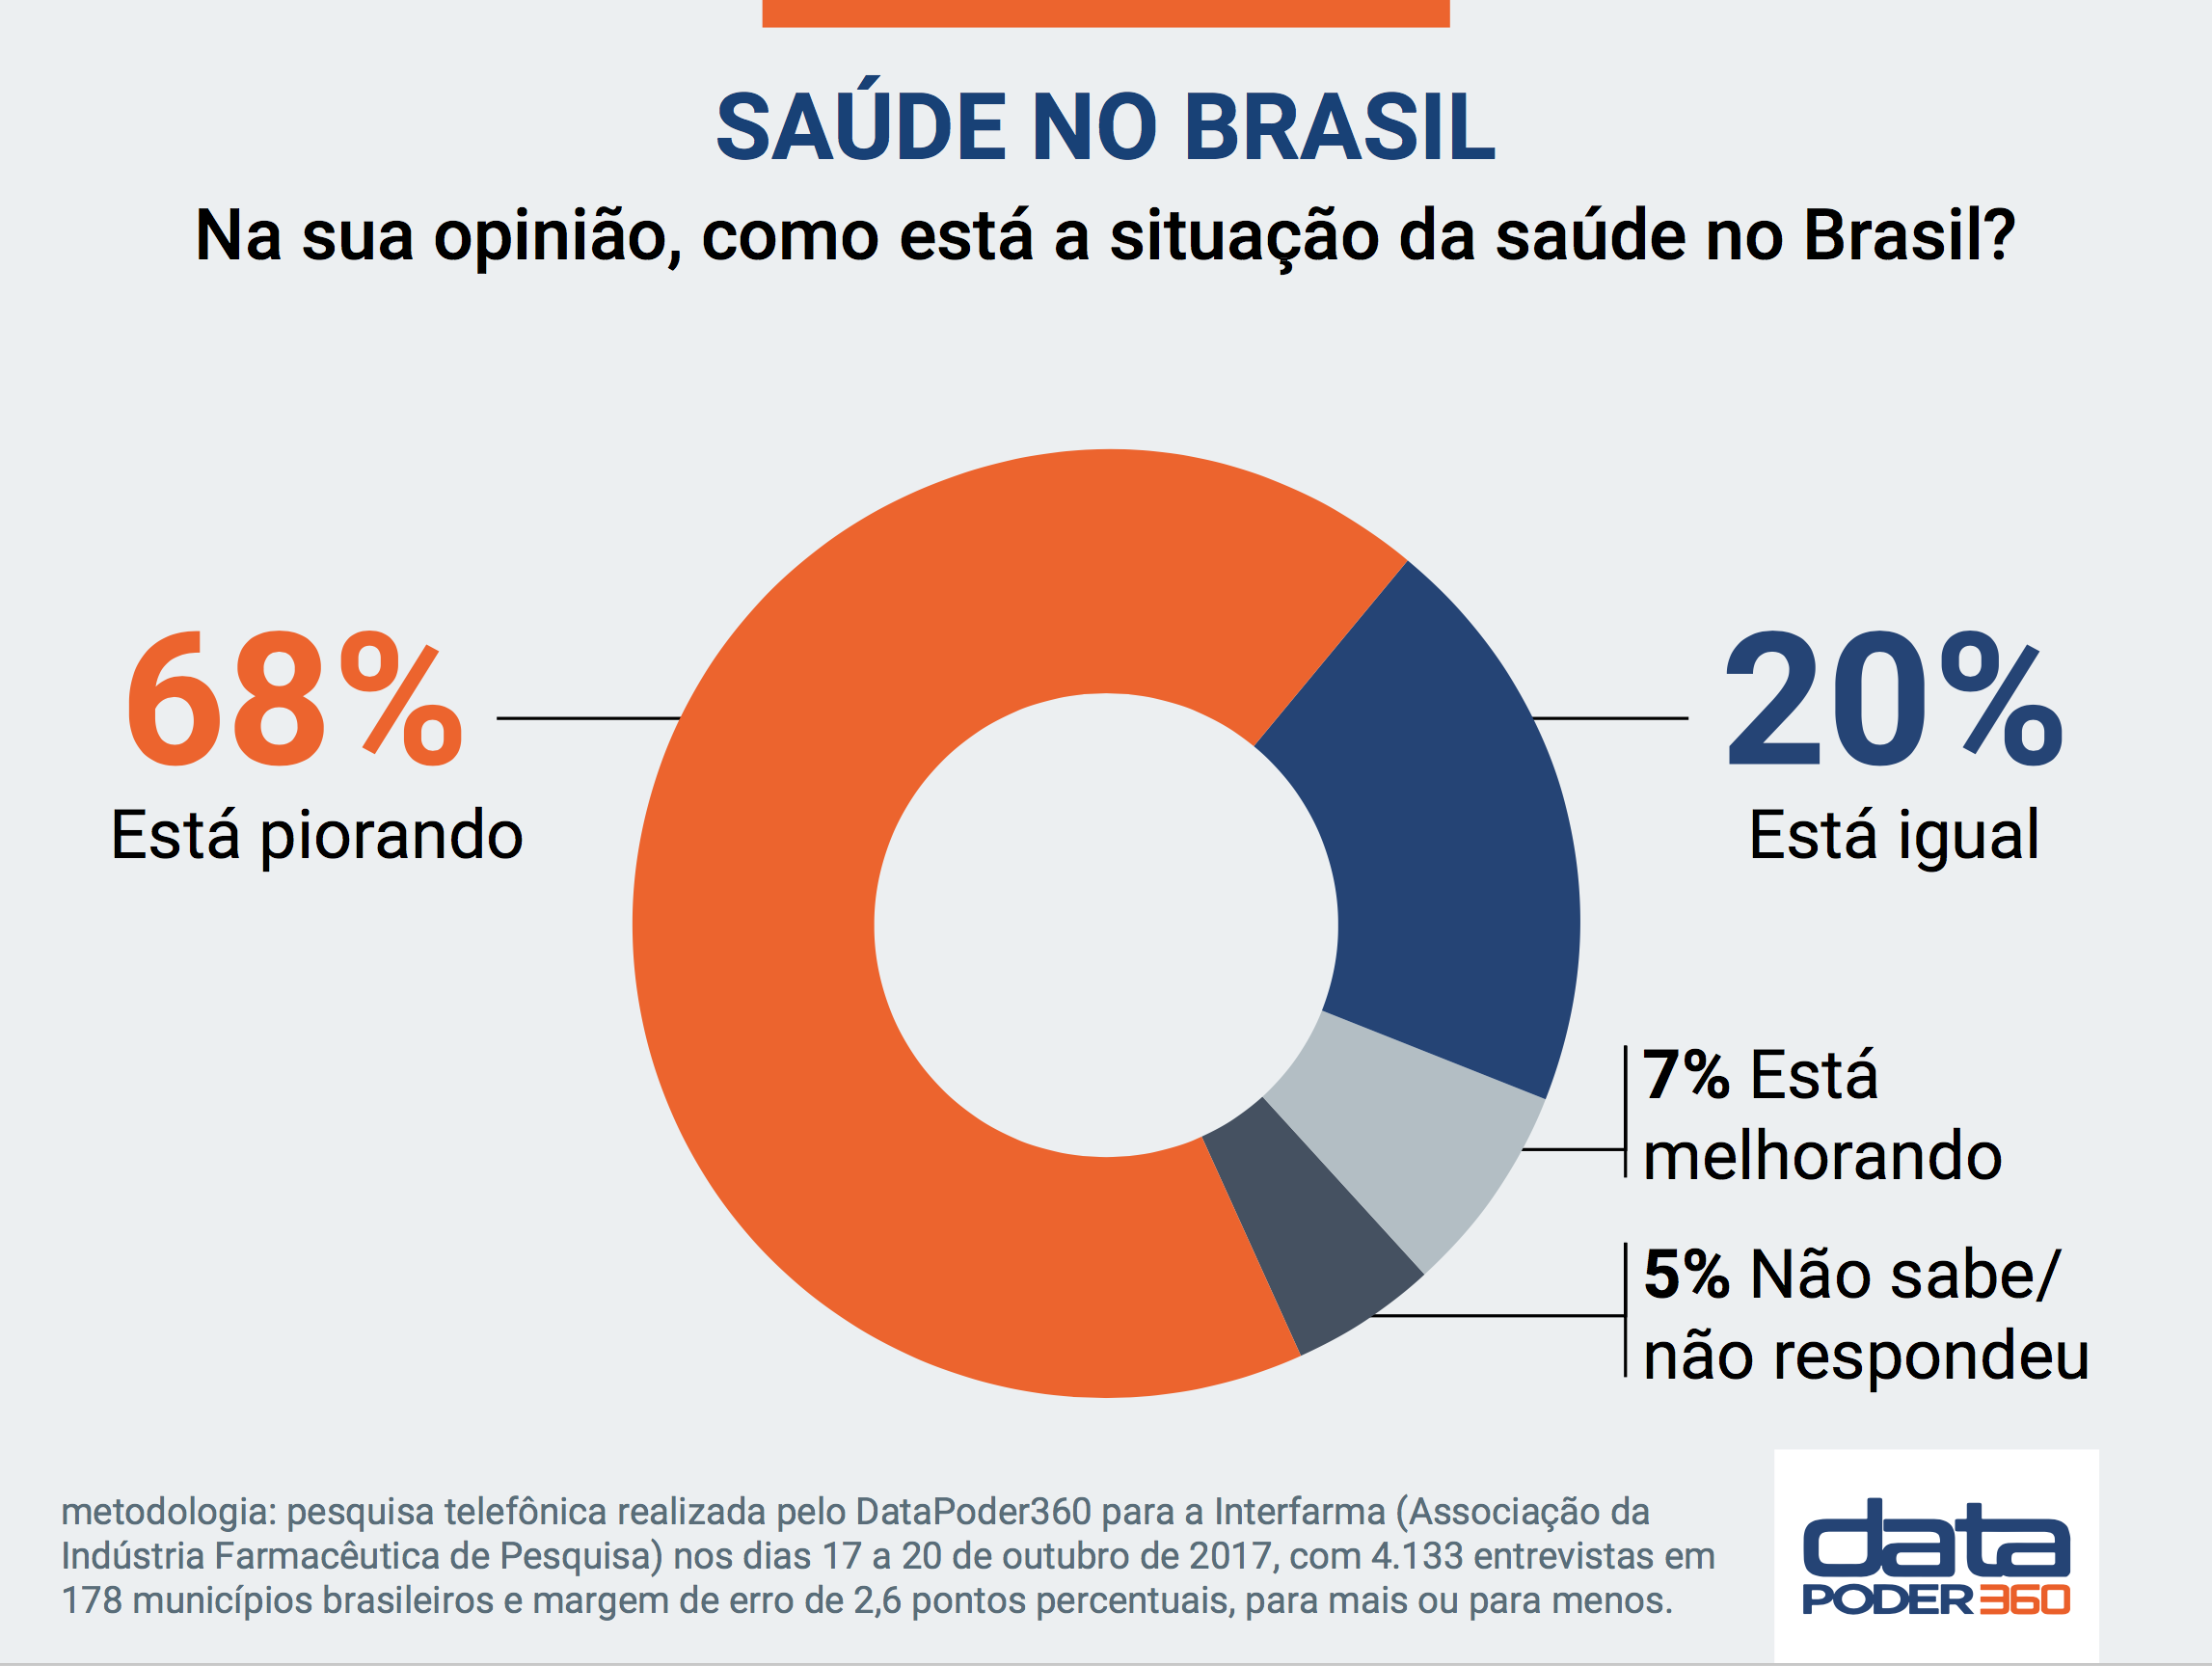 saude no brasil datapoder360 out2017 slide 1 1